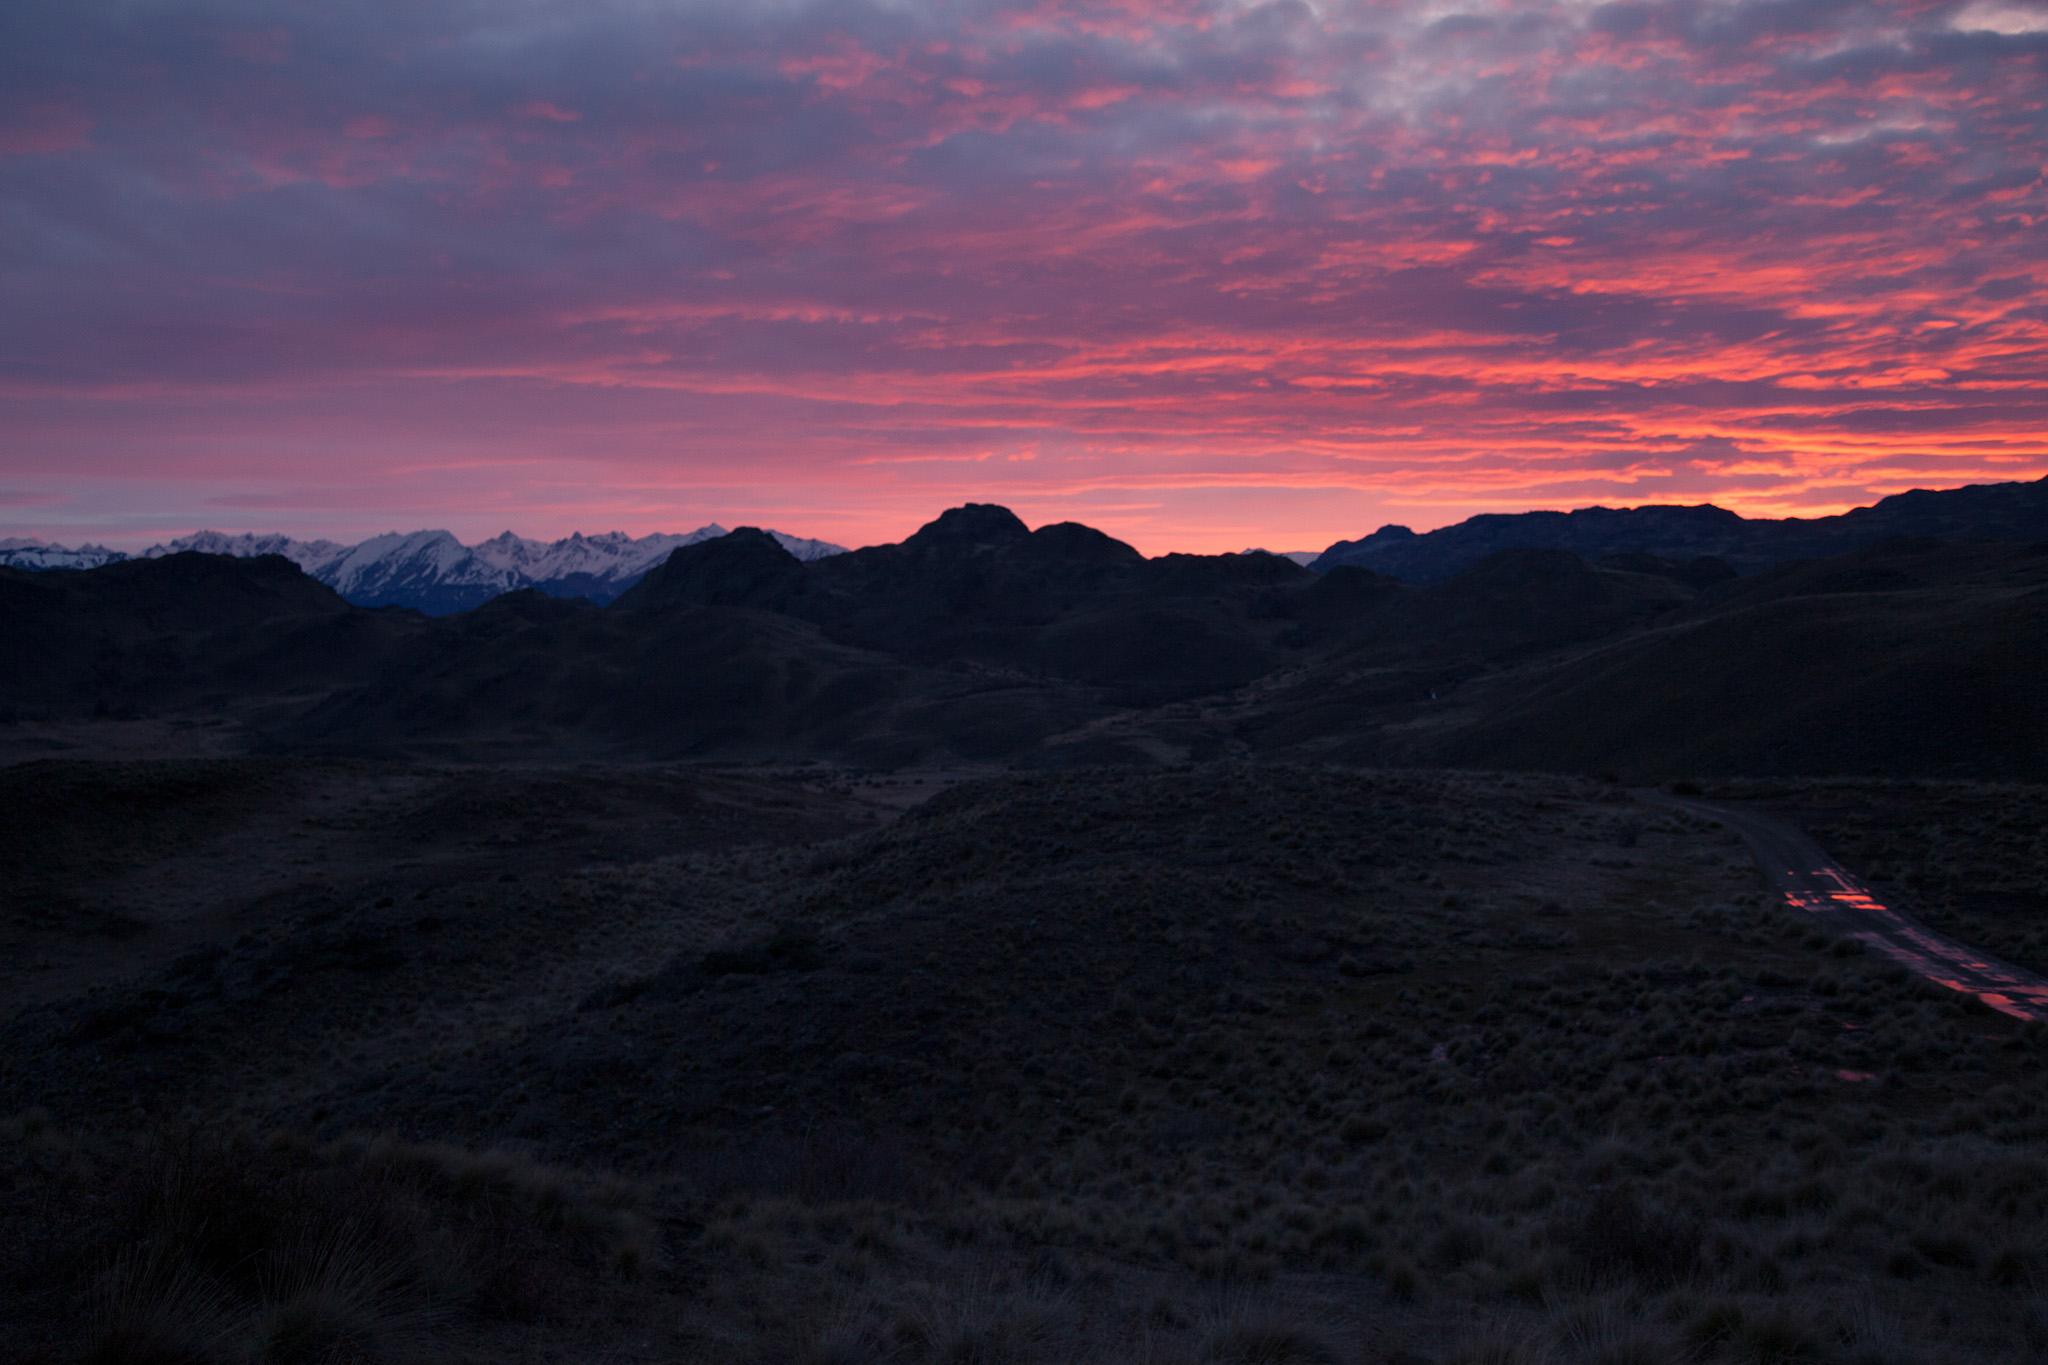 030-TW-Patagonia-140901.jpg